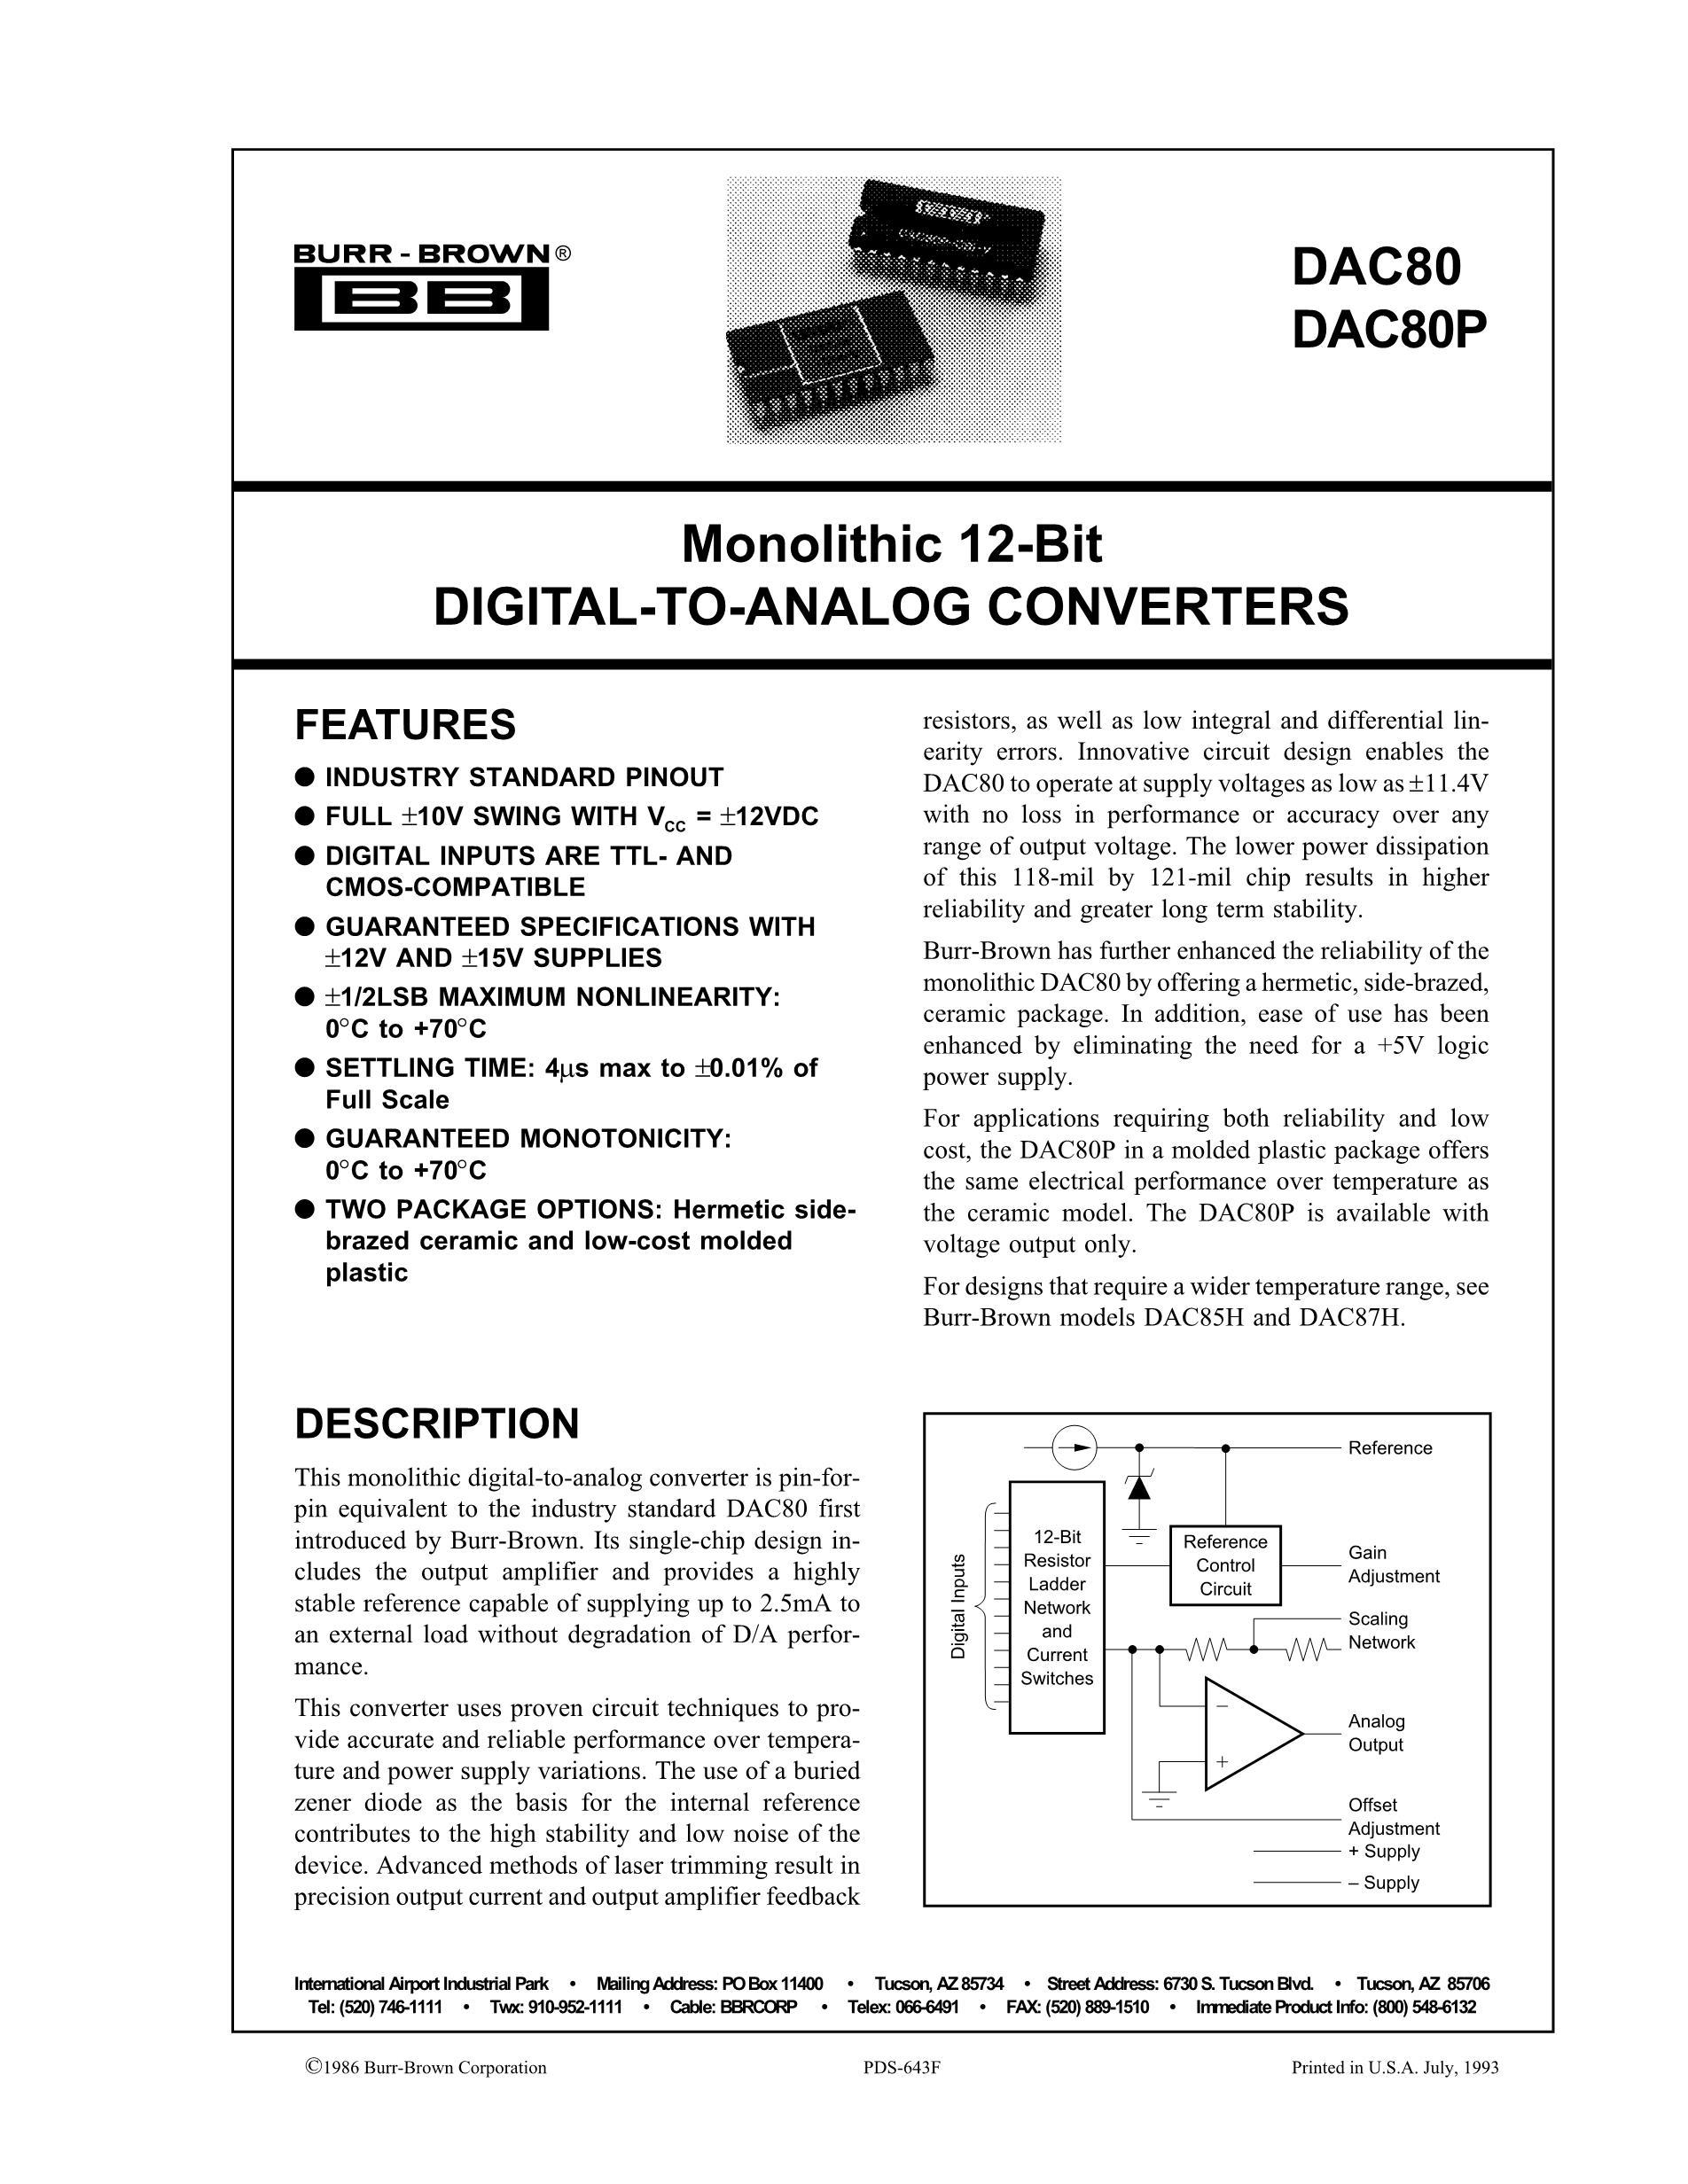 DAC8742HPBS's pdf picture 1